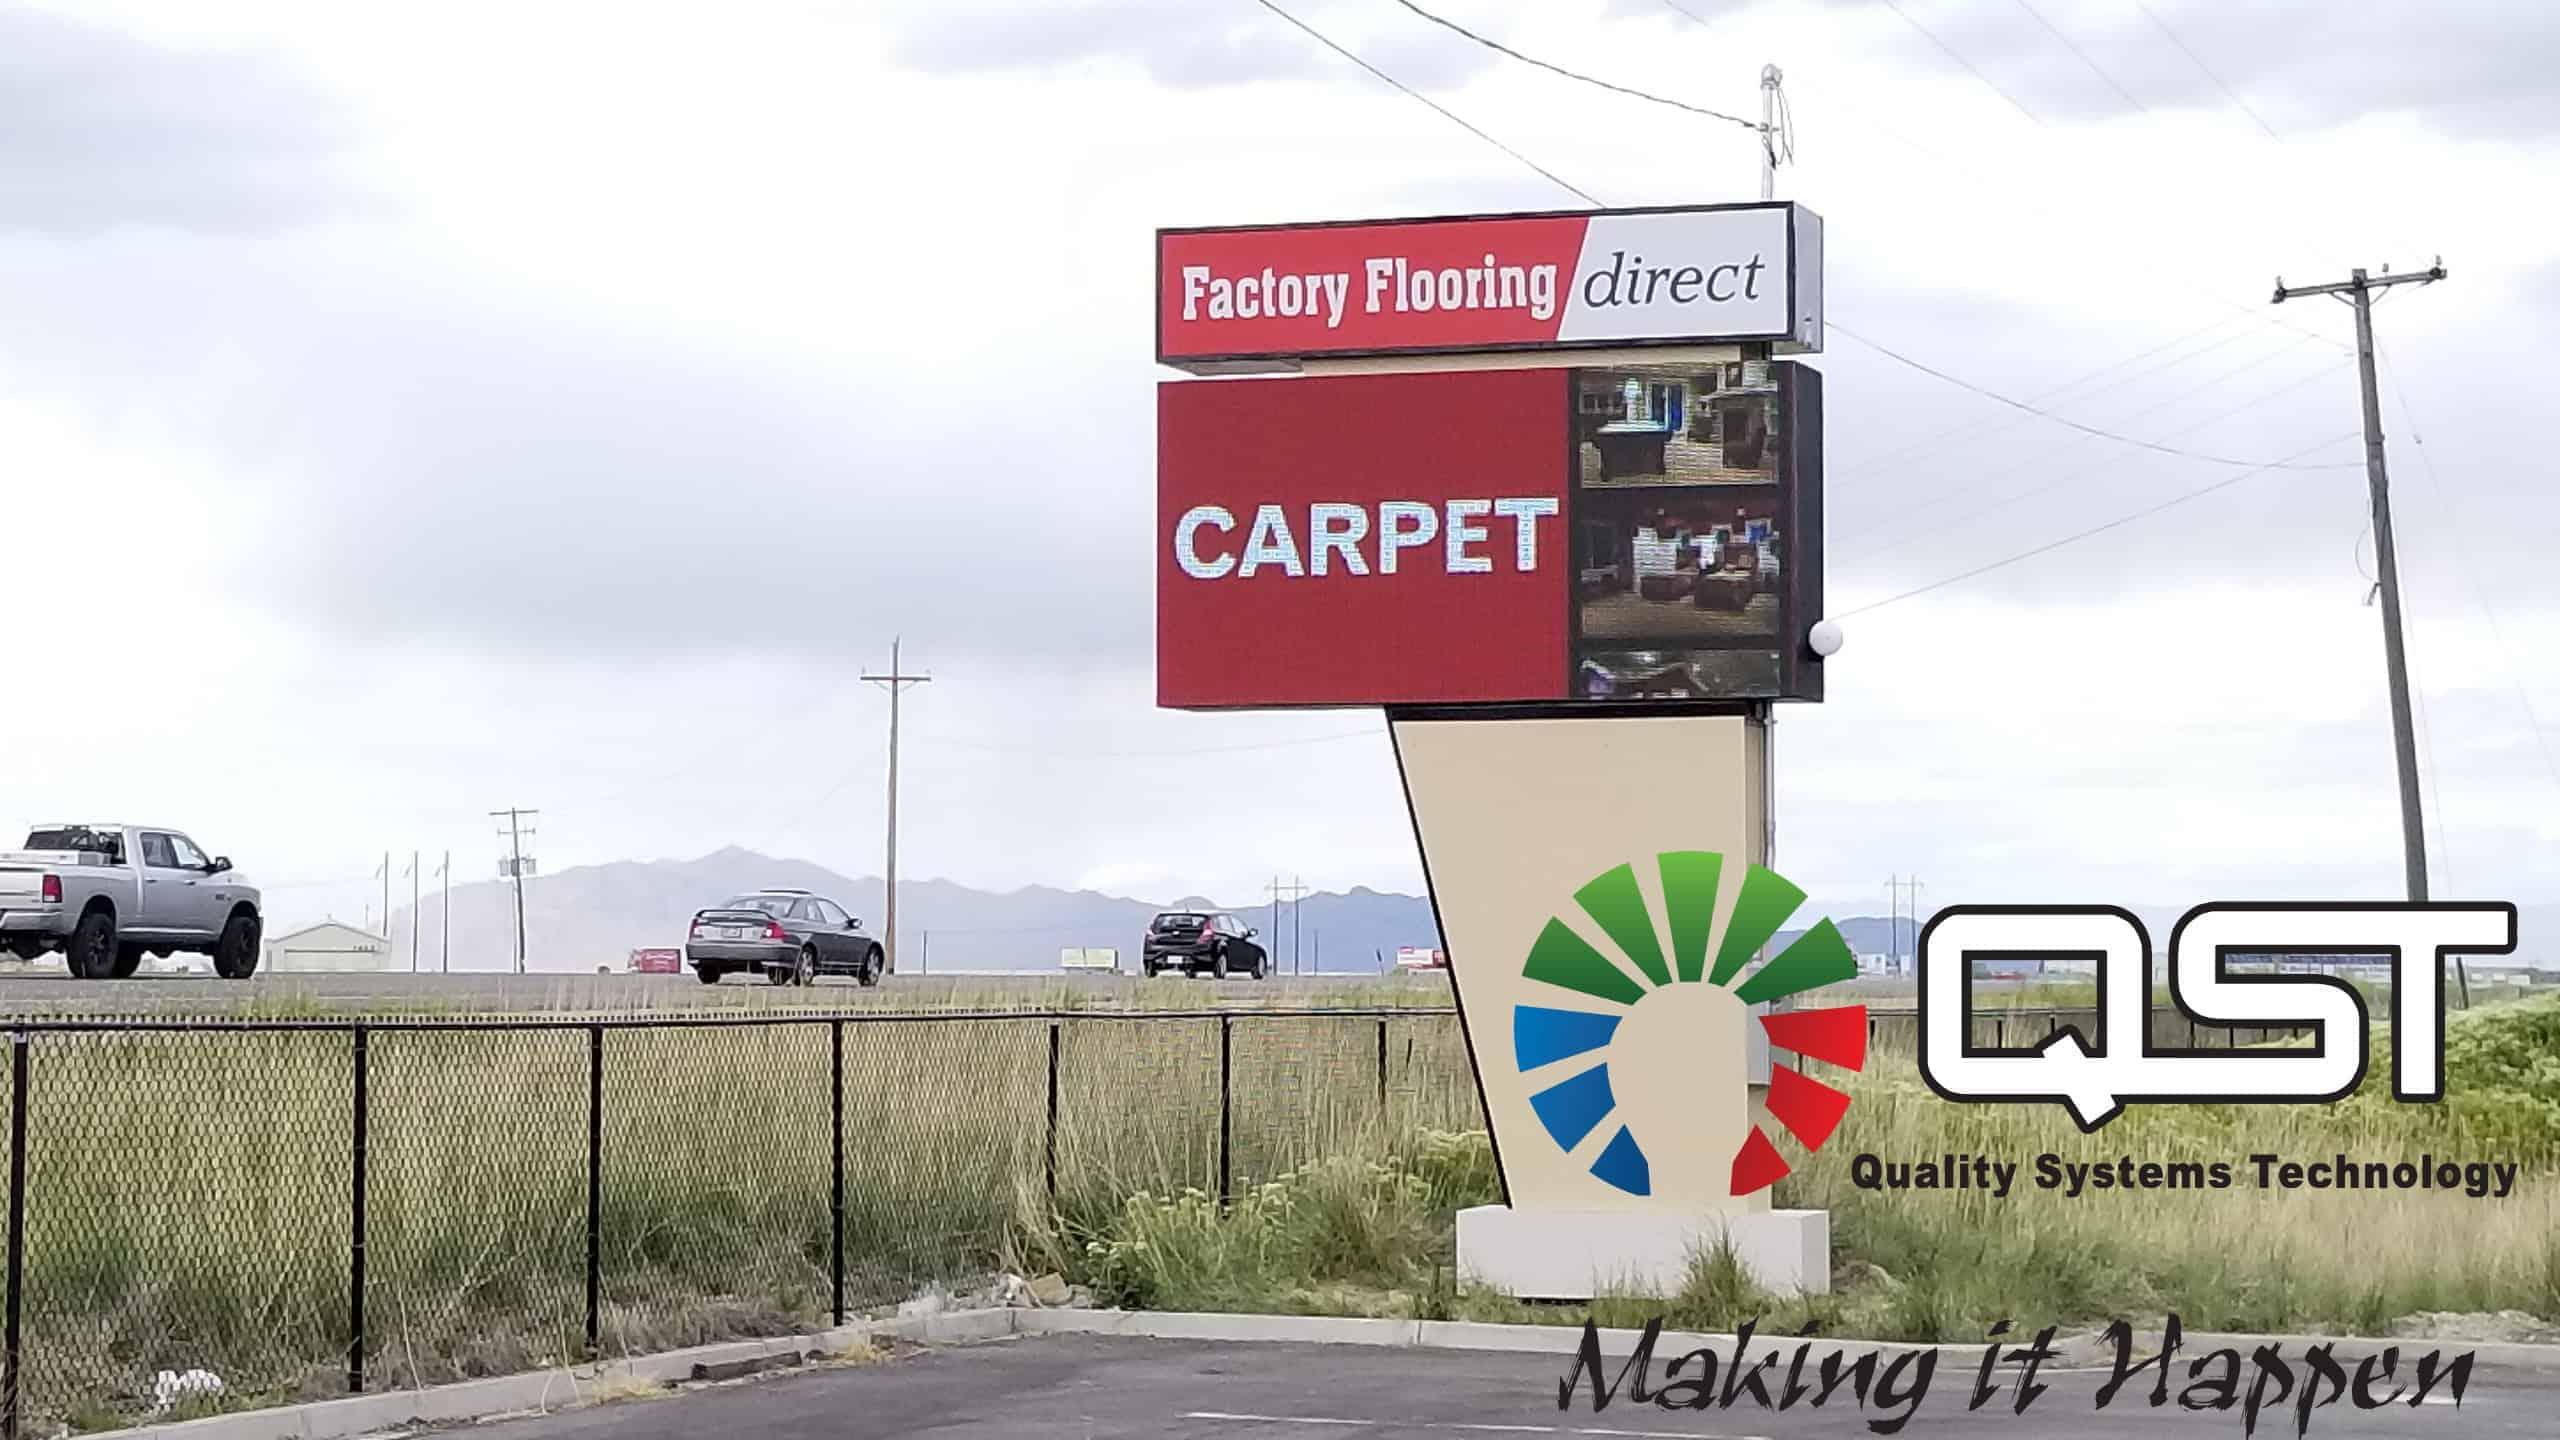 Factory Flooring 16mm HD LED screen install